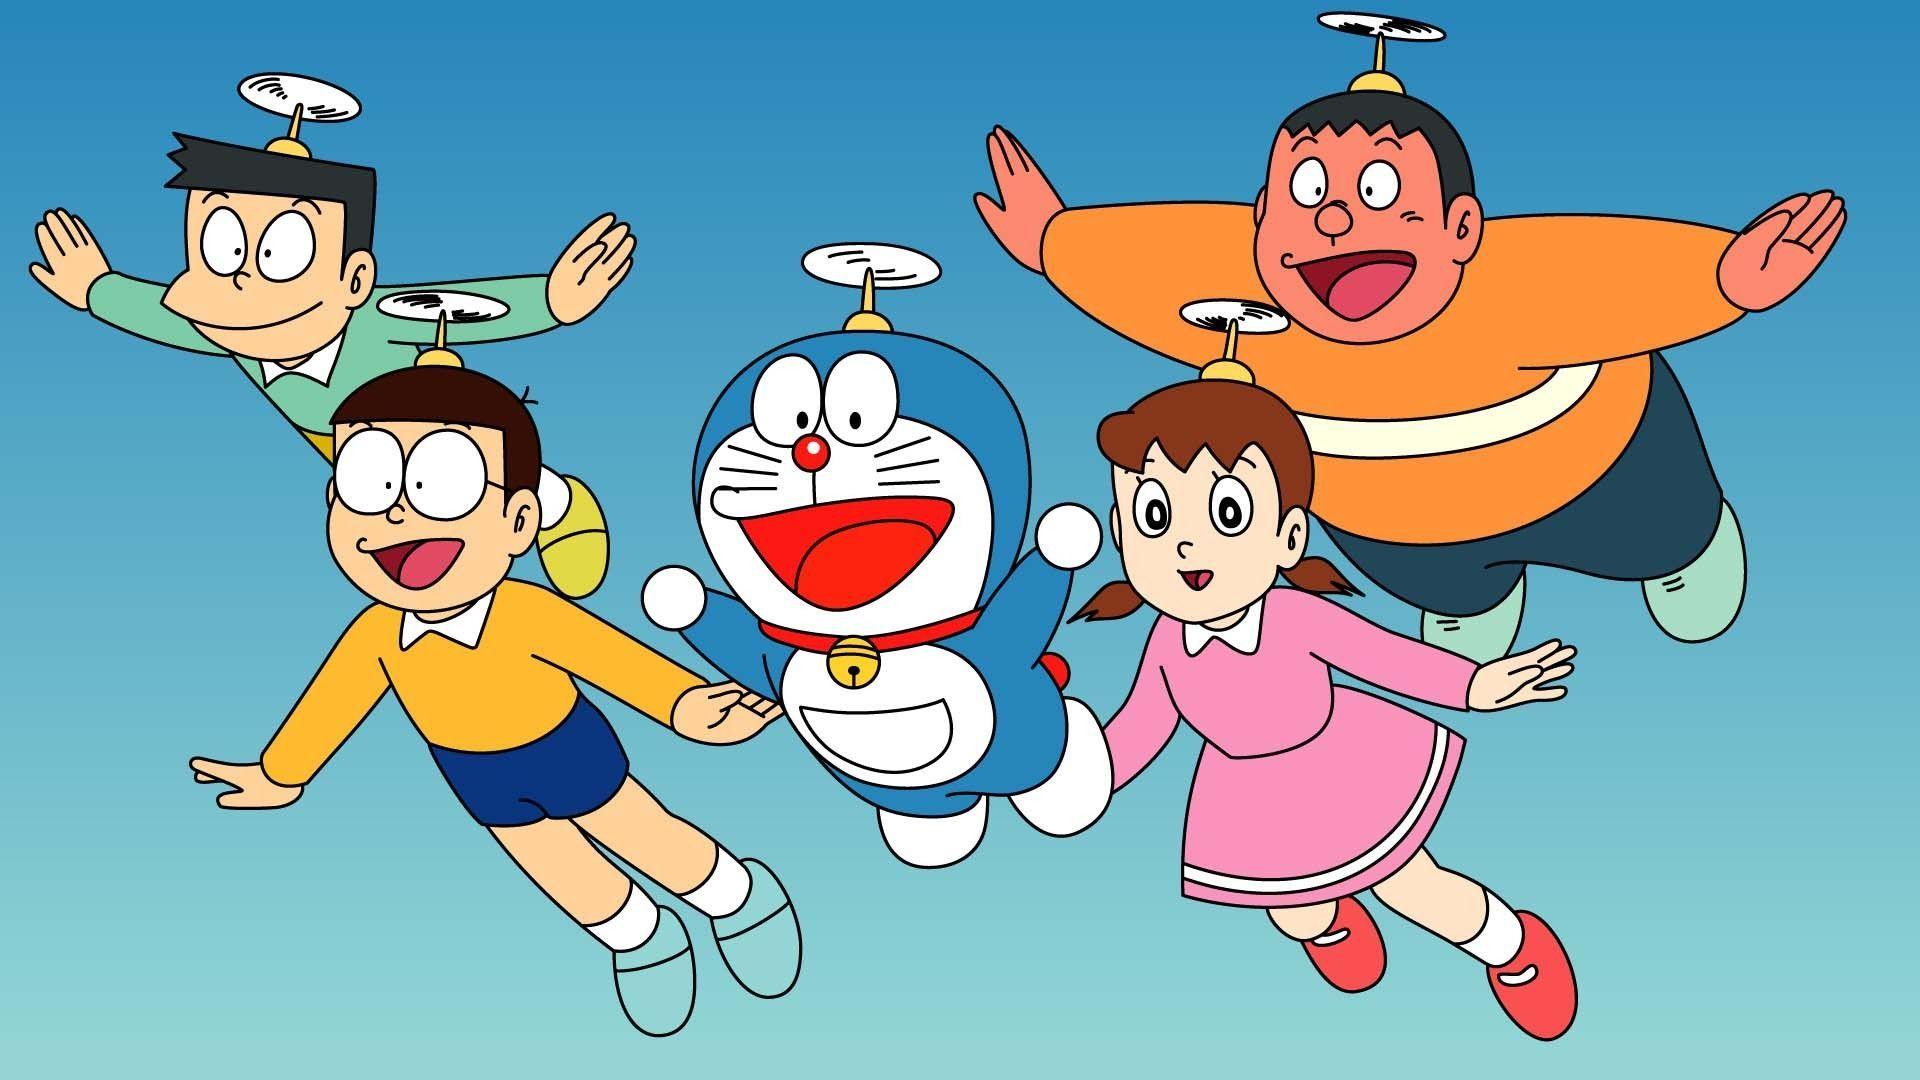 Windows Anime Girls Wallpapers Doraemon Wallpapers Hd Pixelstalk Net